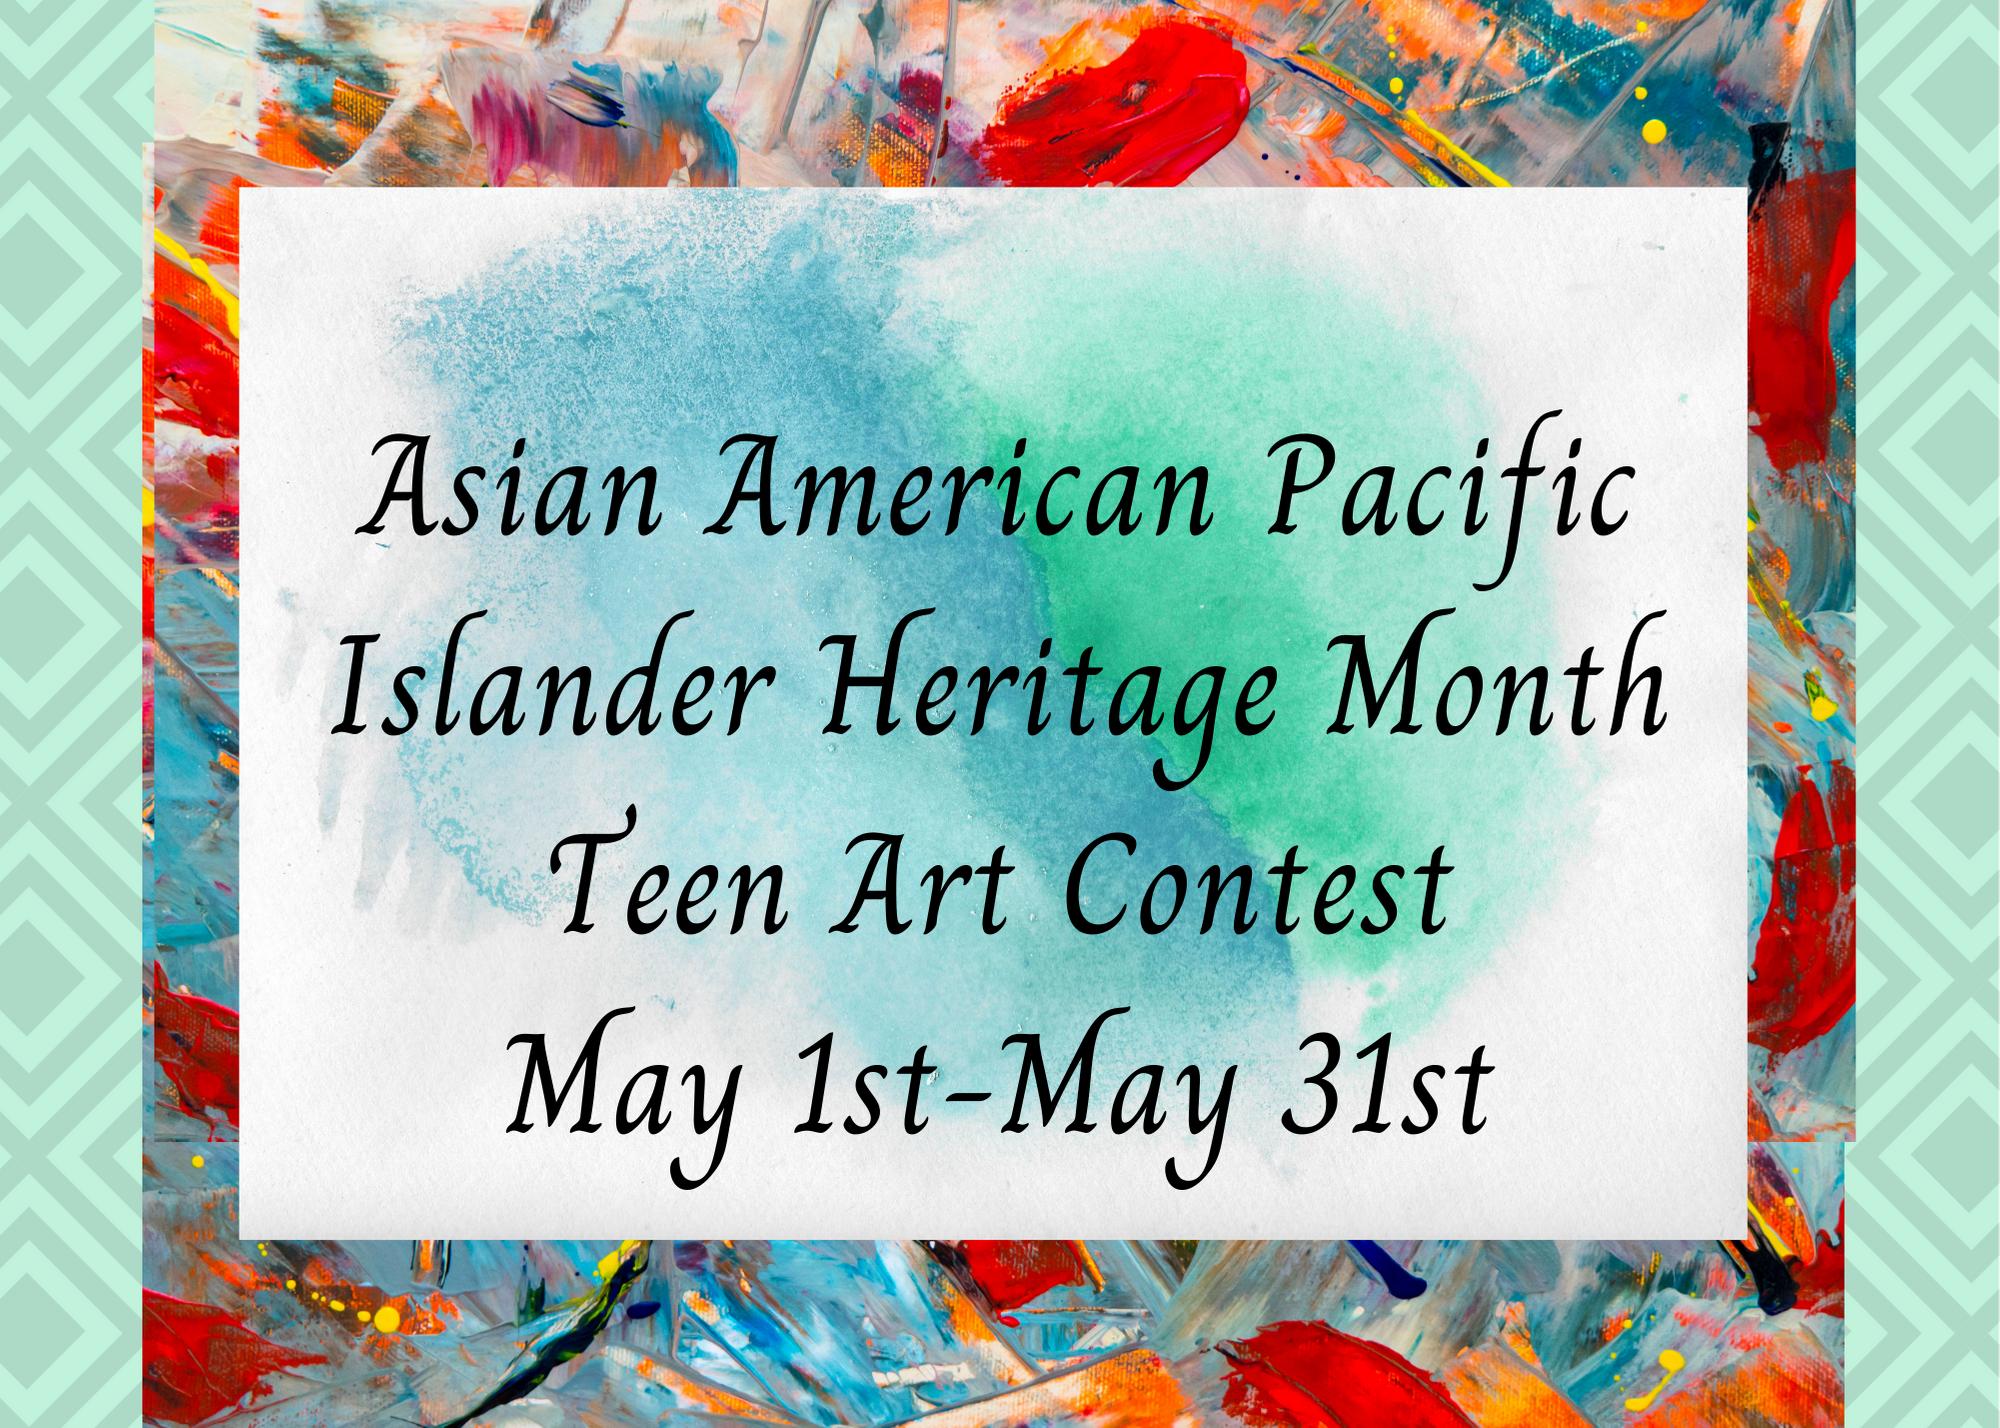 Asian American Pacific Islander Heritage Month Teen Art Contest